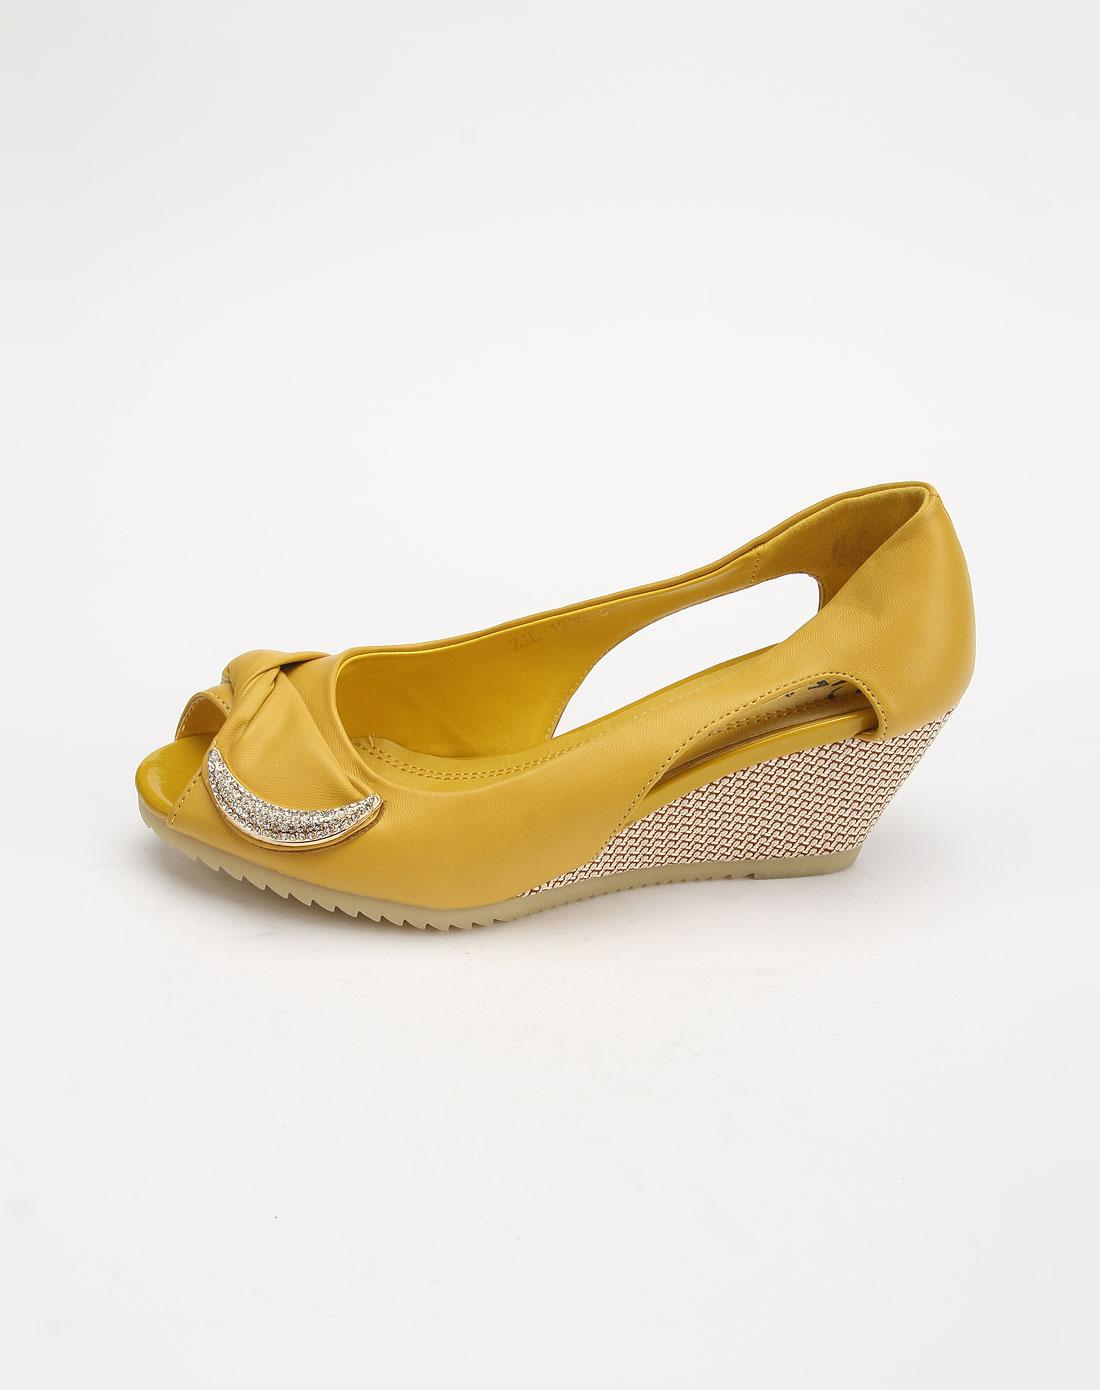 FASOLI黄色时尚牛筋底鱼嘴坡跟鞋1239实木框床图片